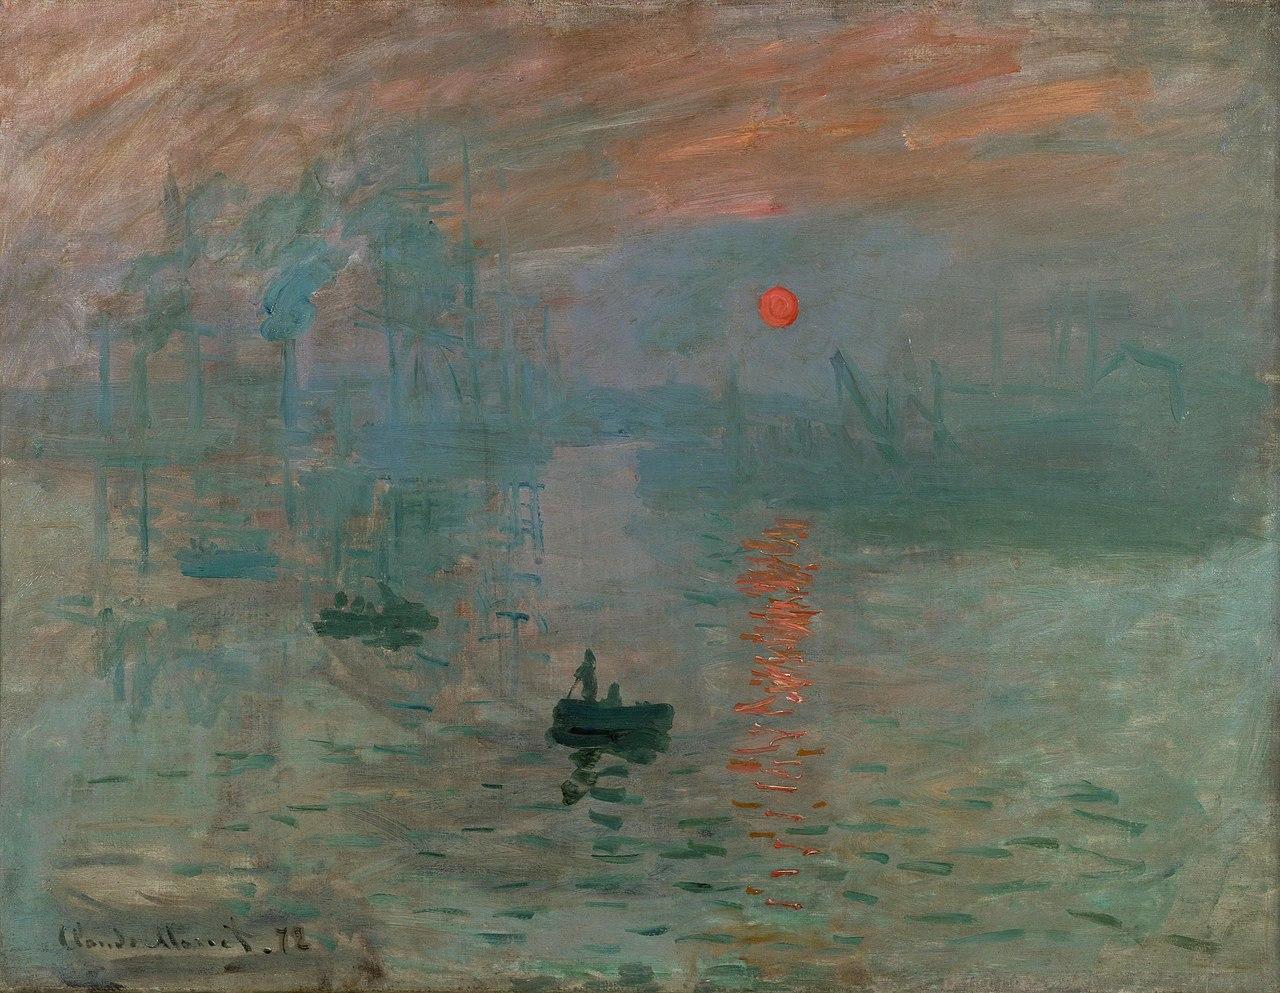 https://upload.wikimedia.org/wikipedia/commons/thumb/5/59/Monet_-_Impression%2C_Sunrise.jpg/1280px-Monet_-_Impression%2C_Sunrise.jpg